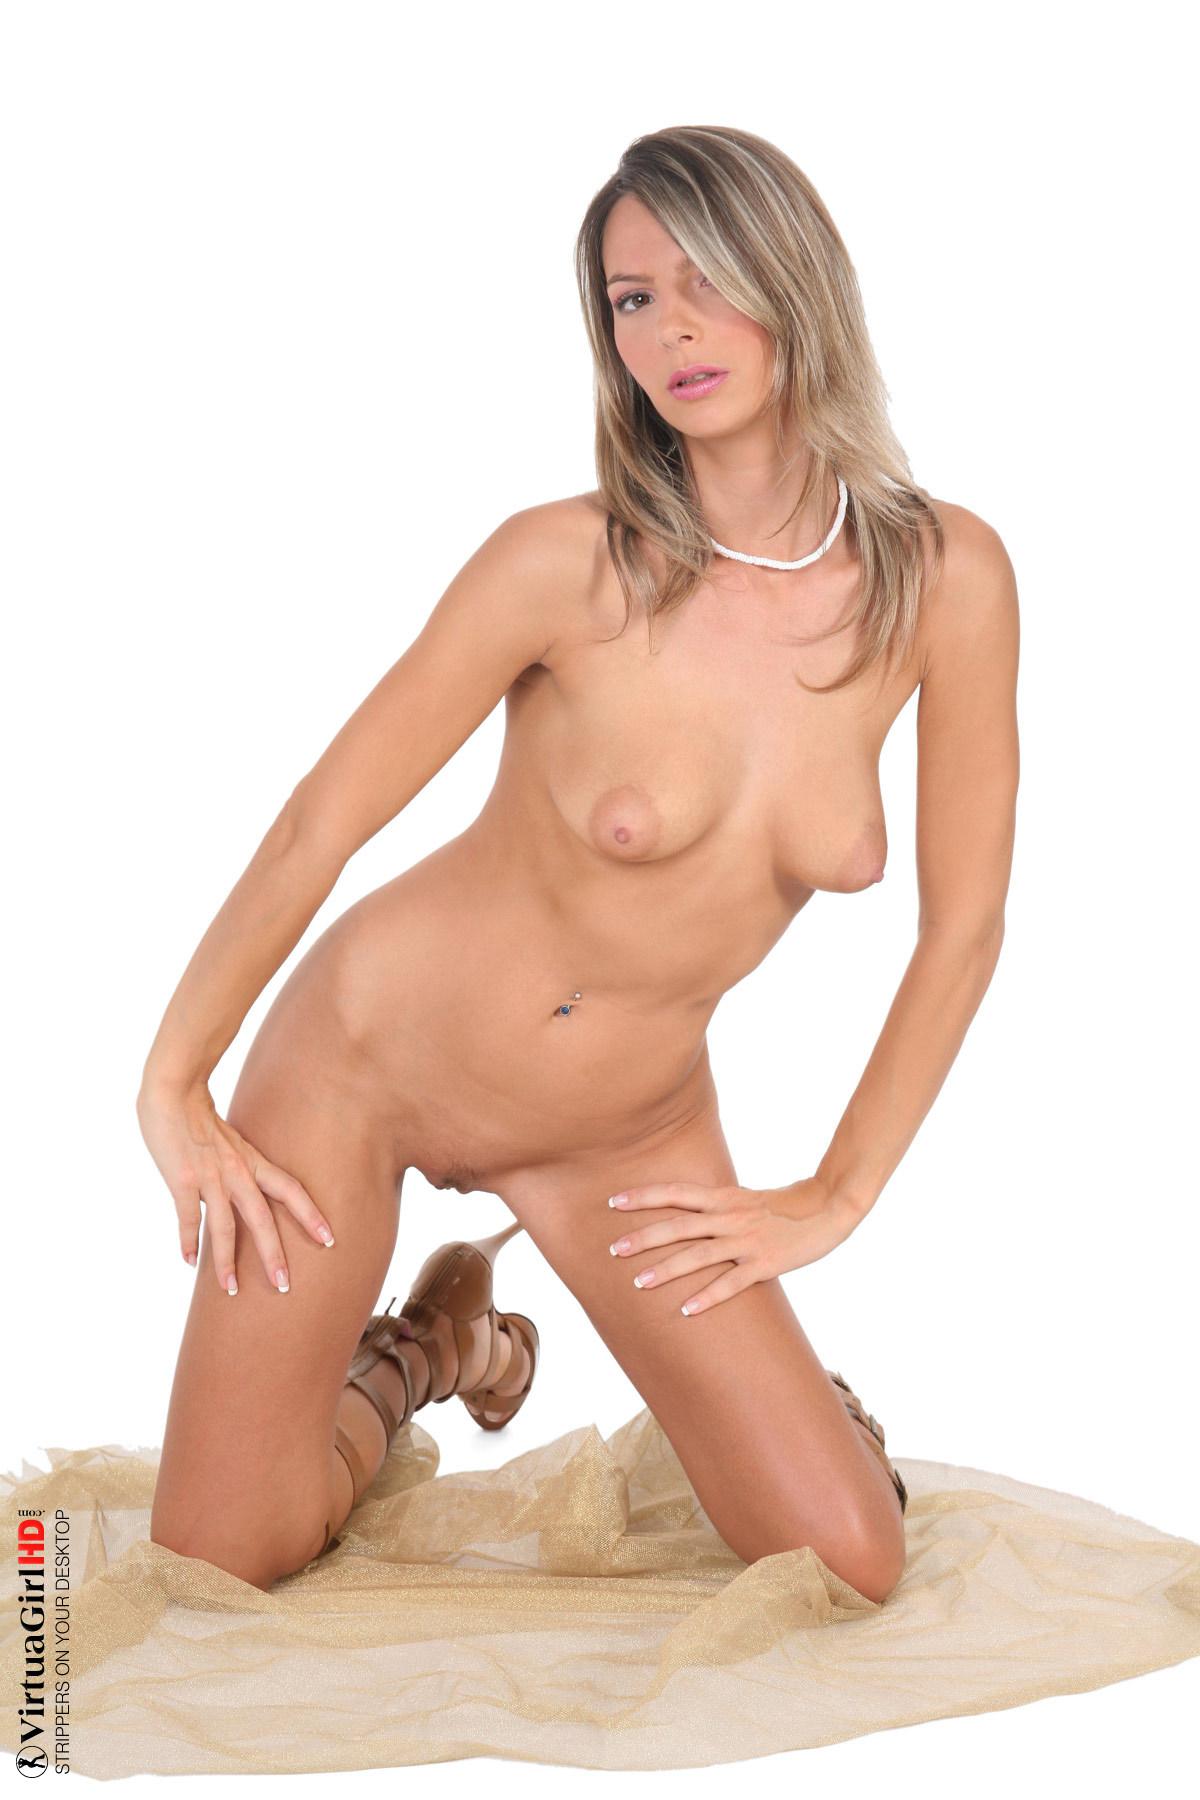 hot korean girls stripping naked